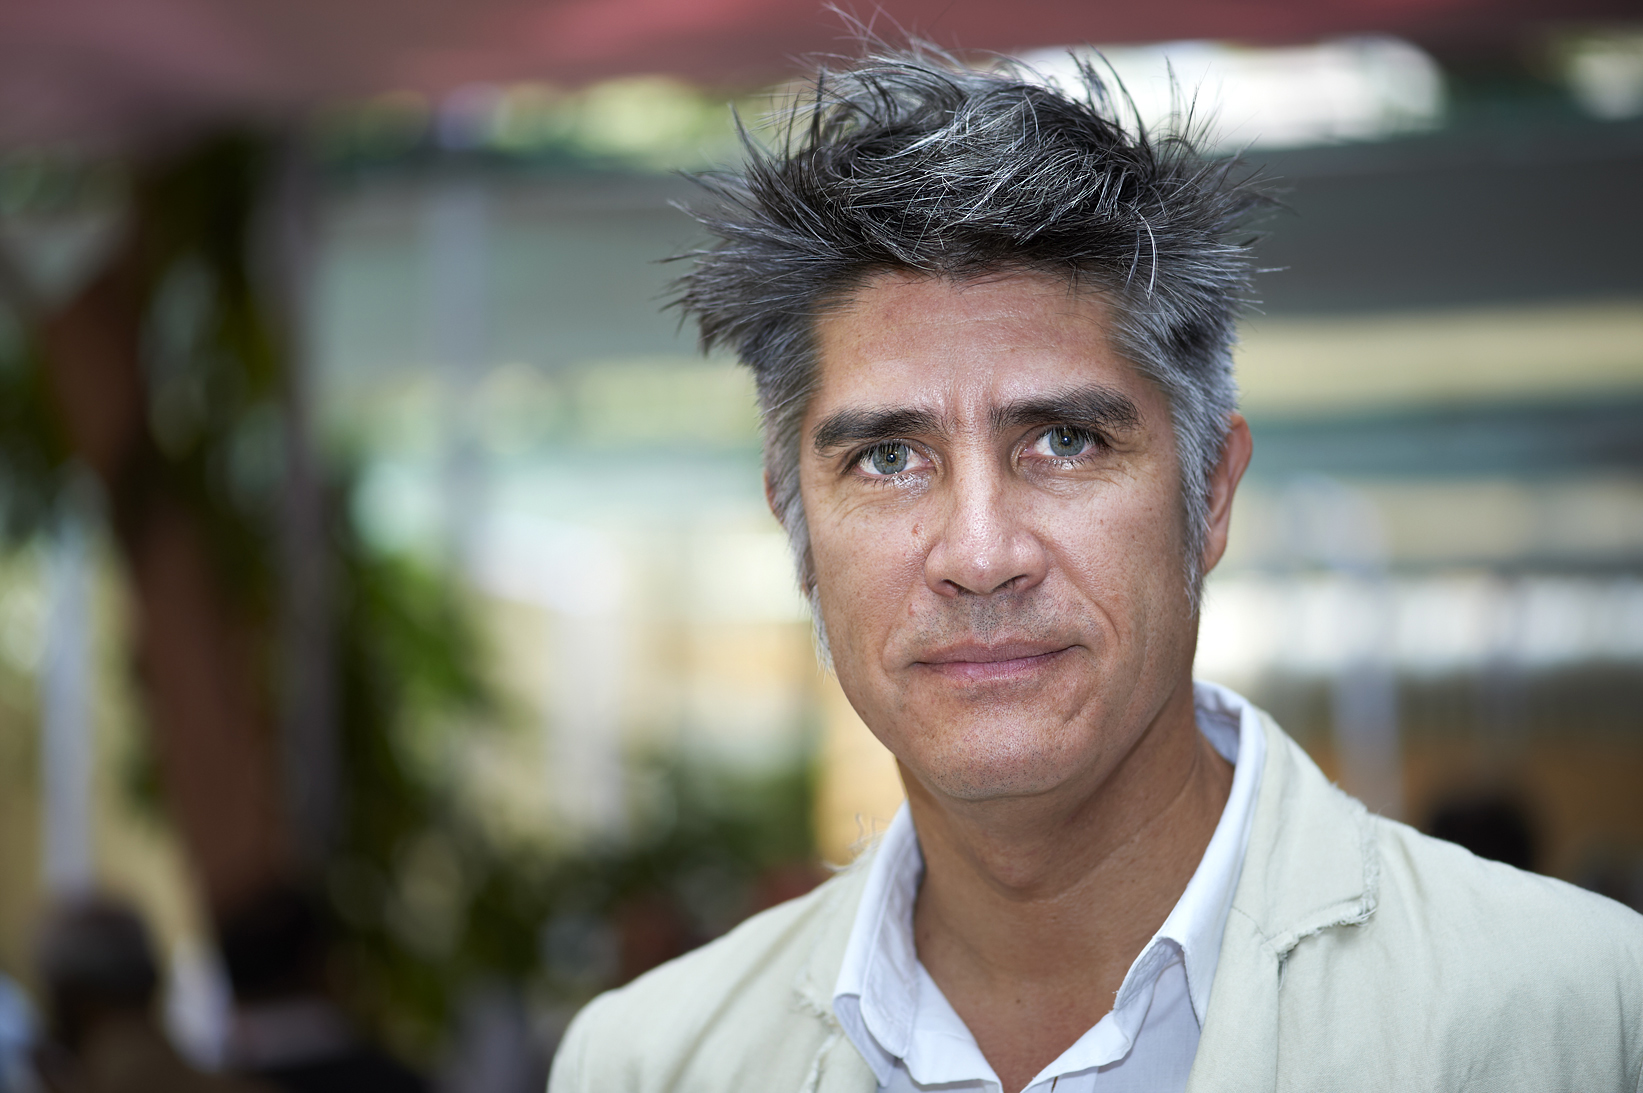 Alejandro Aravena, the 2016 Pritzker Architecture Prize Laureate